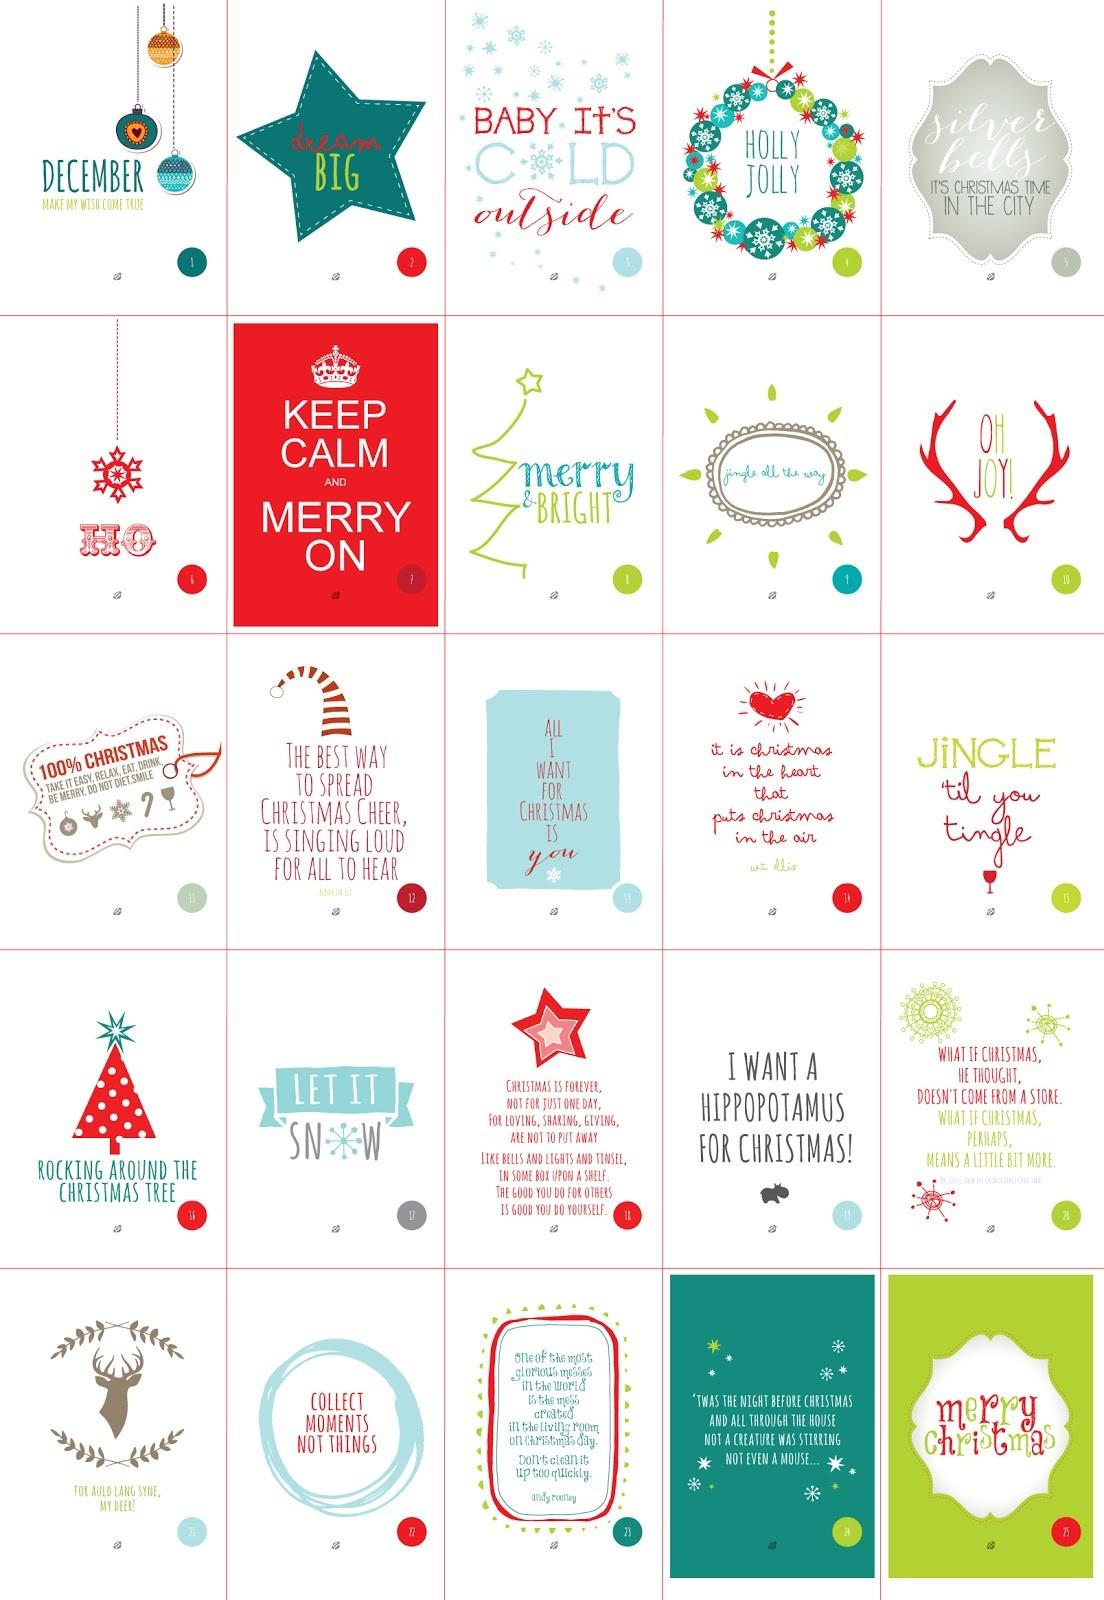 Free Printable Advent Calendar Template Advent Calendar Printable intended for Christmas Calendar Printable Template